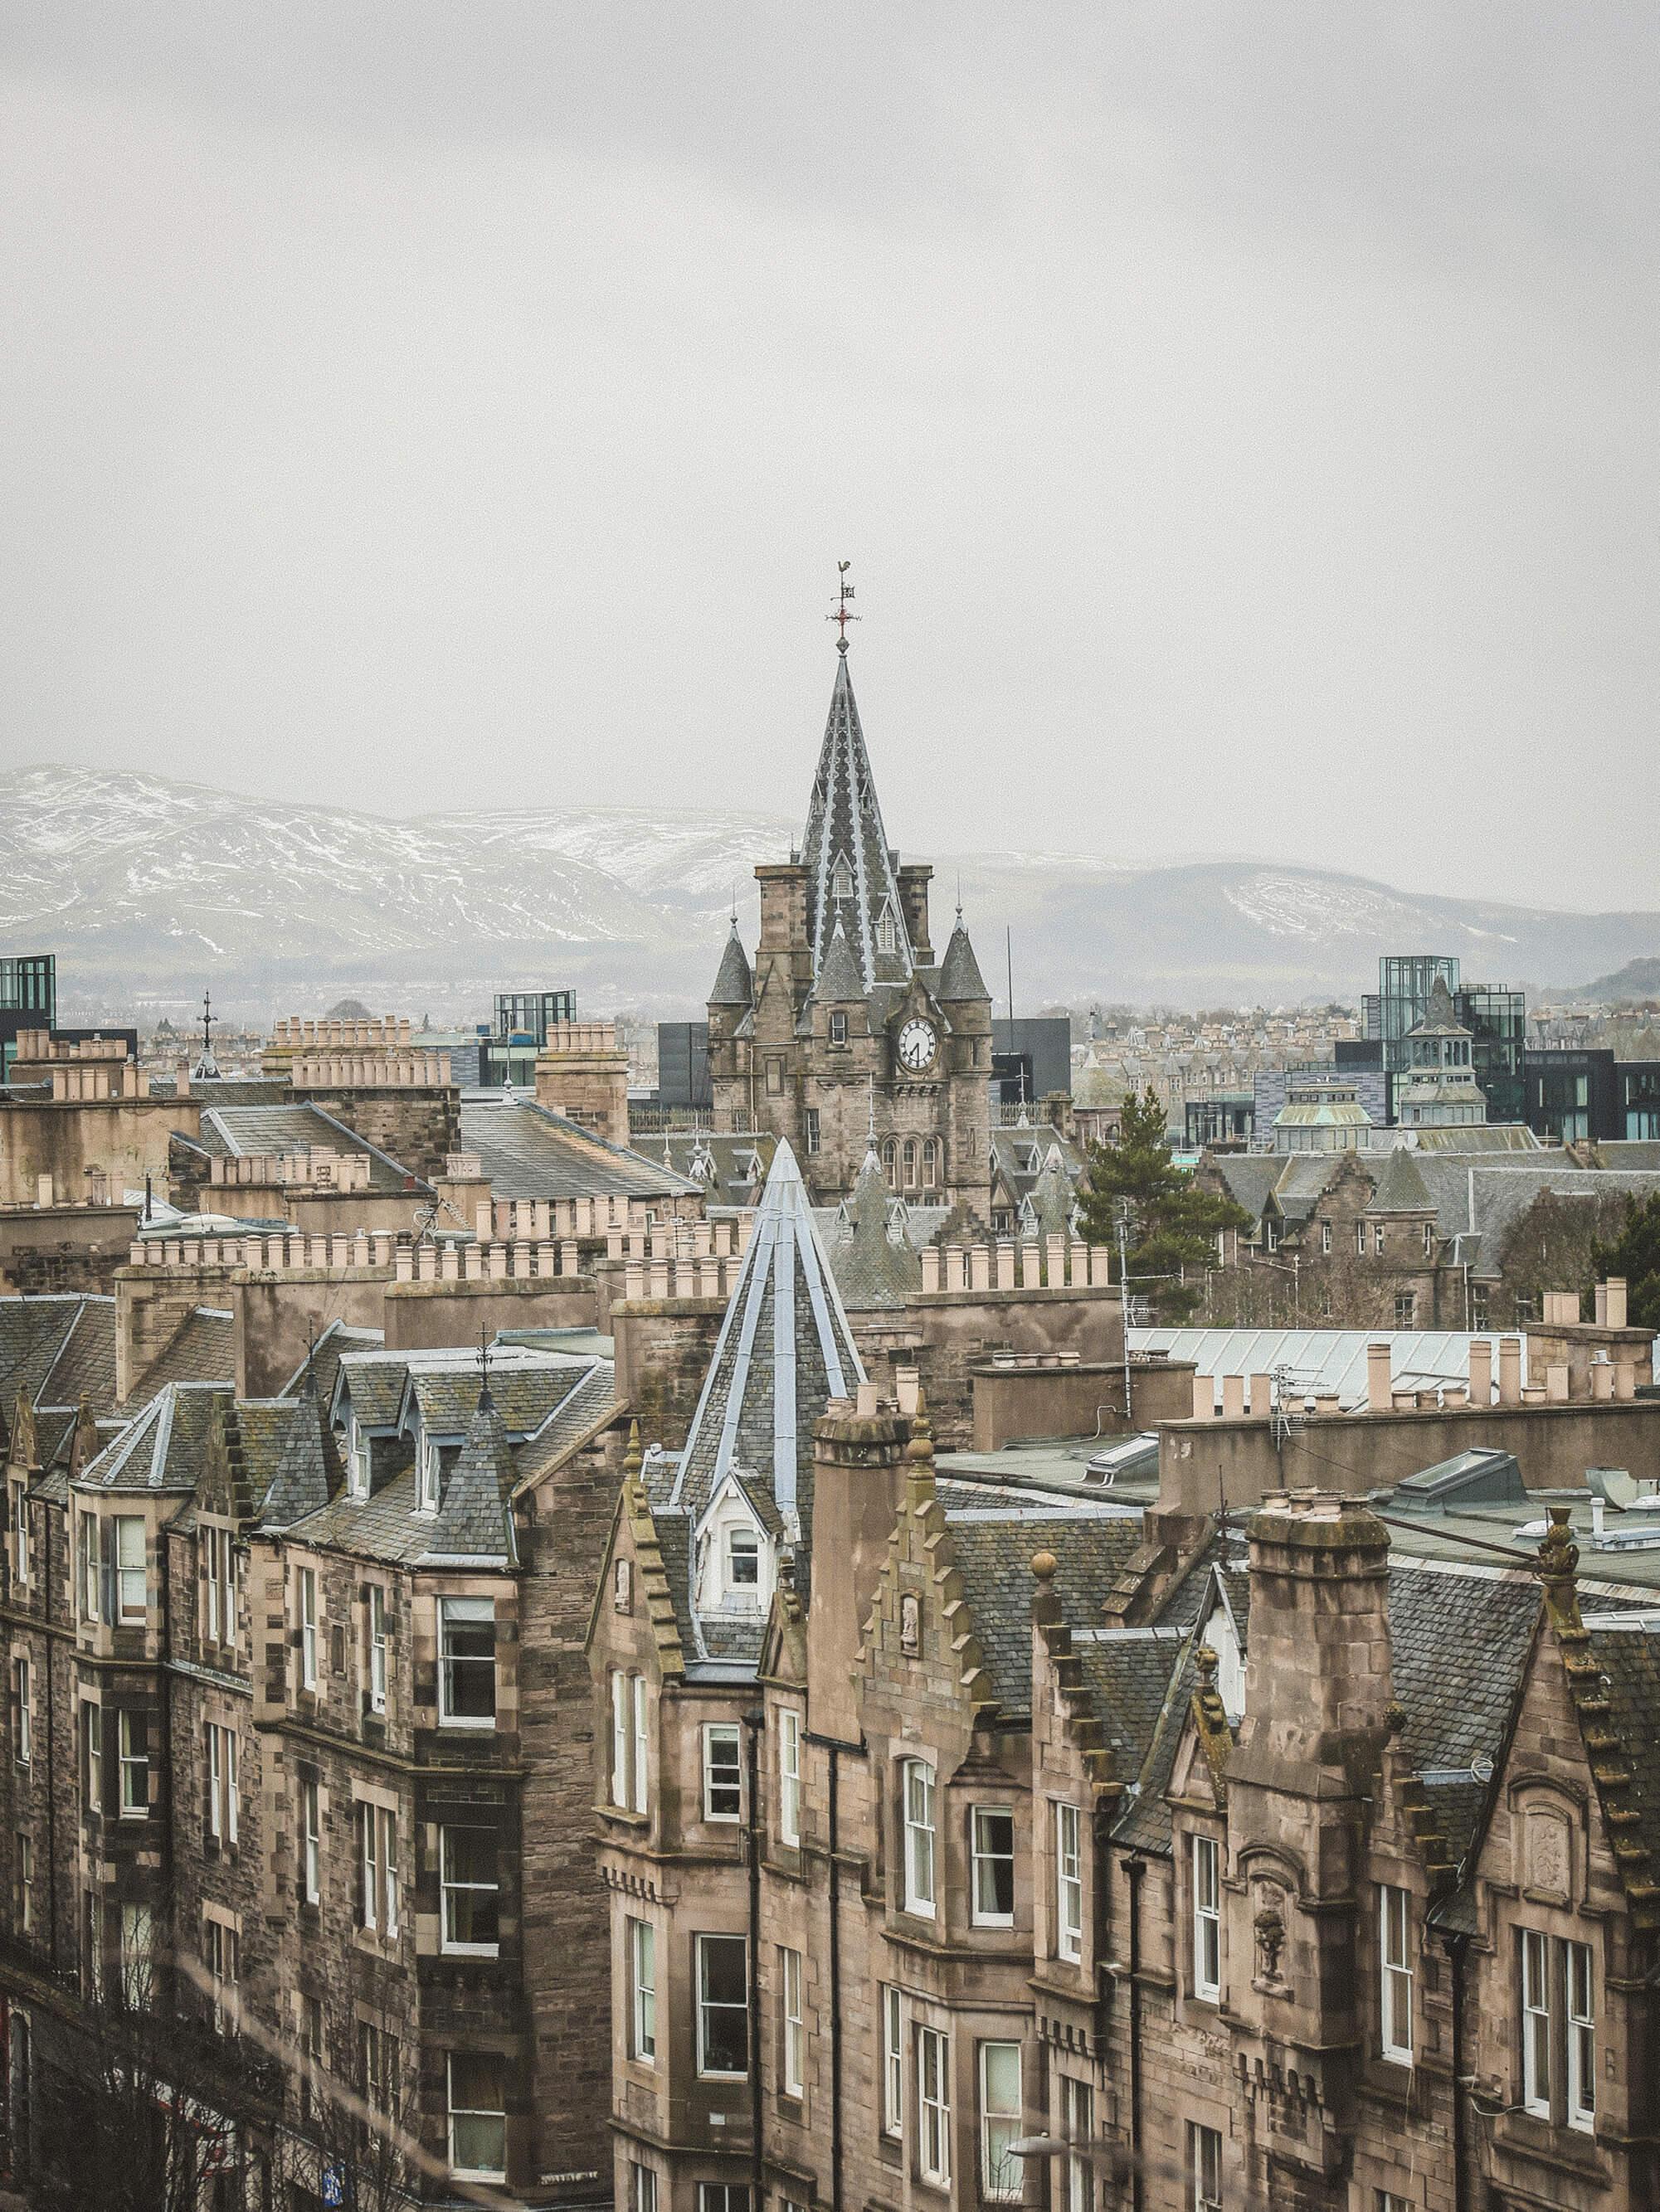 Best-Viewpoints-In-Edinburgh